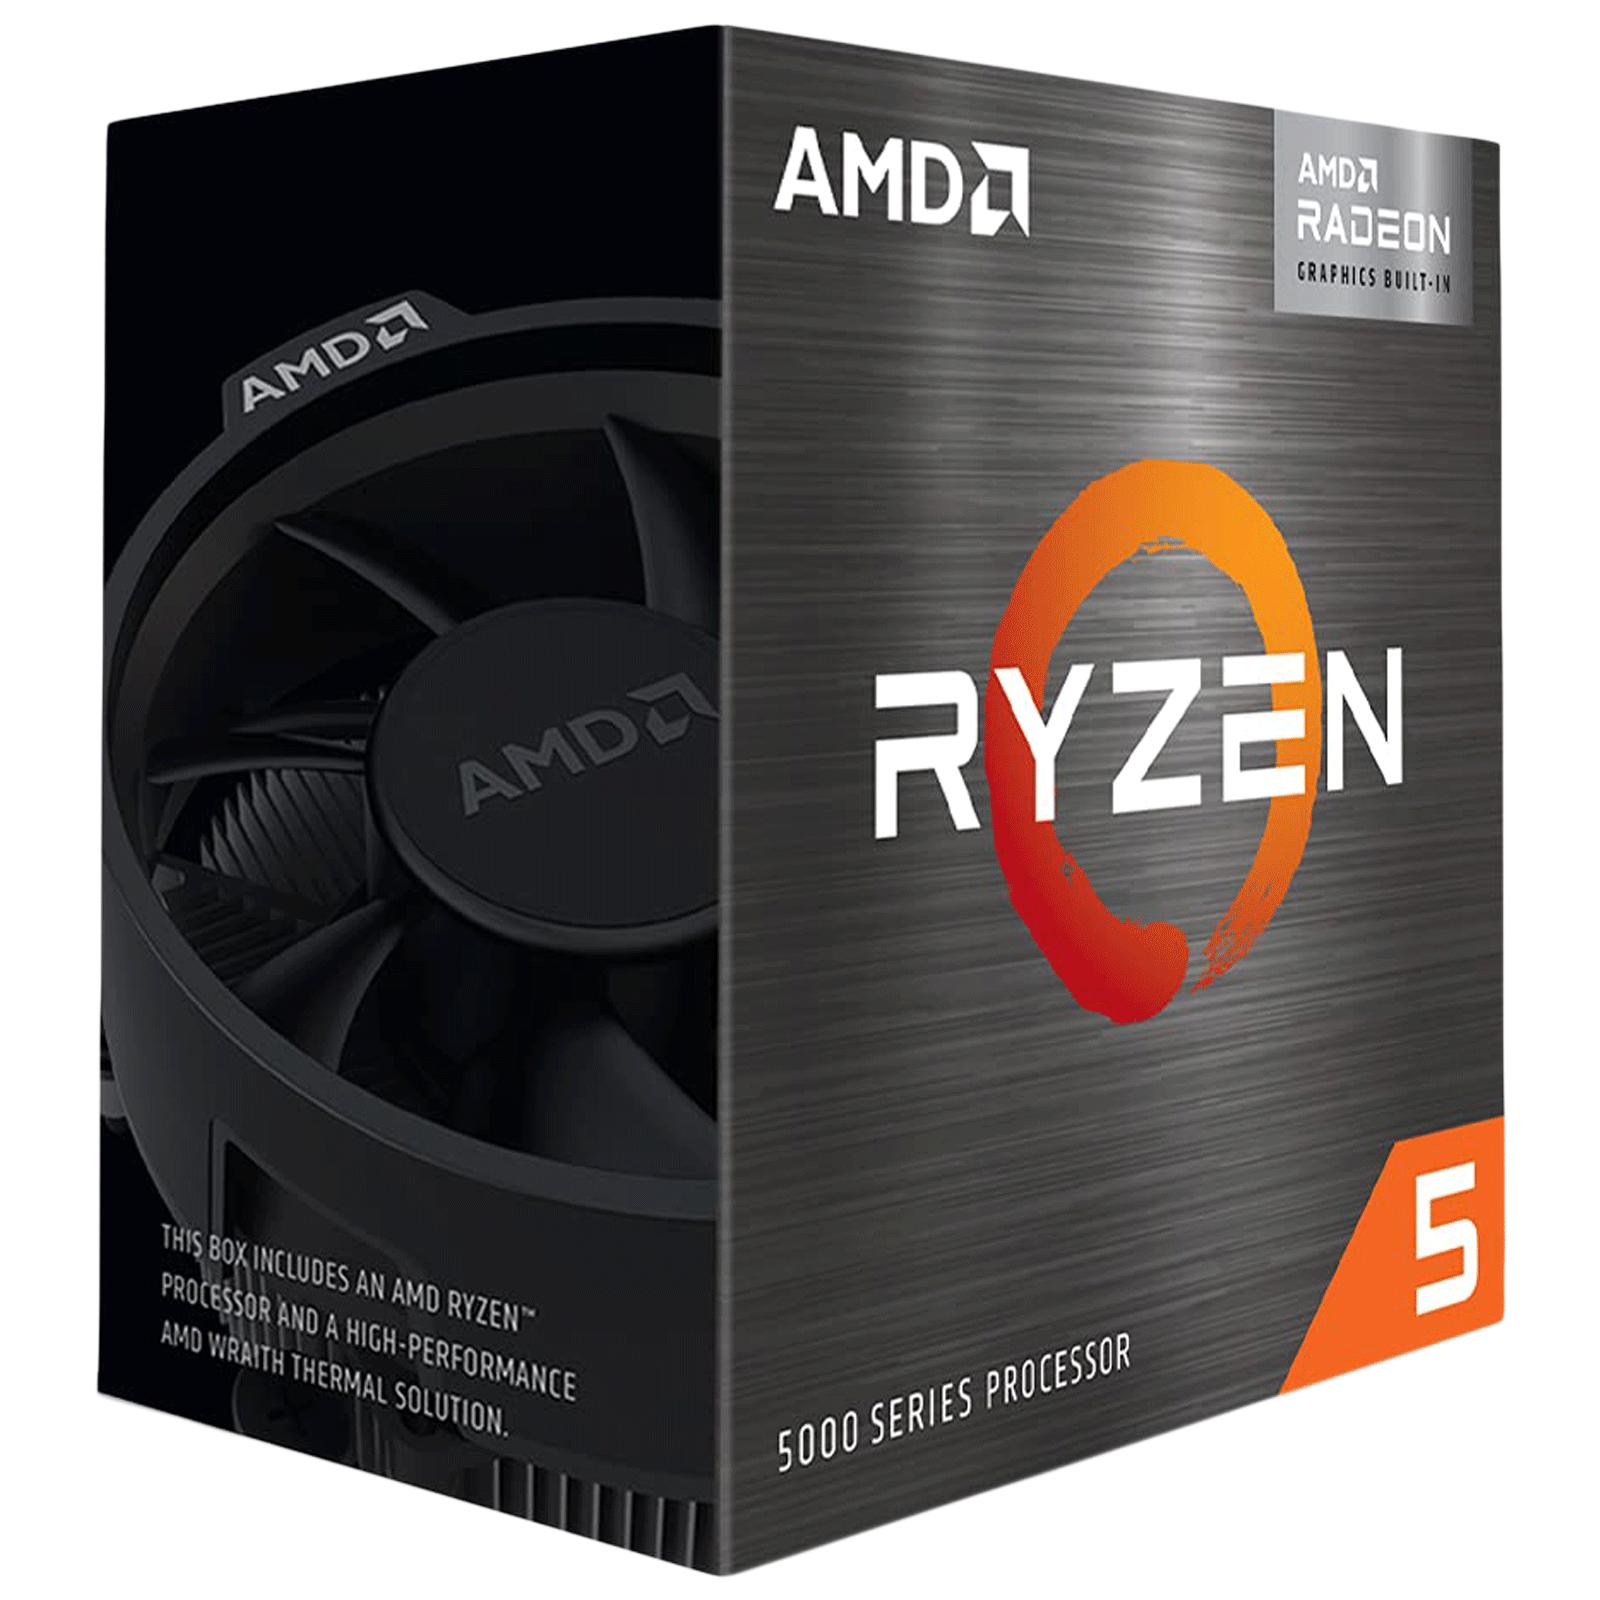 AMD Ryzen 5 Desktop Processor (6 Cores, 3.7 GHz, AMD Zen 3 Core Architecture, 5600X, Silver)_1